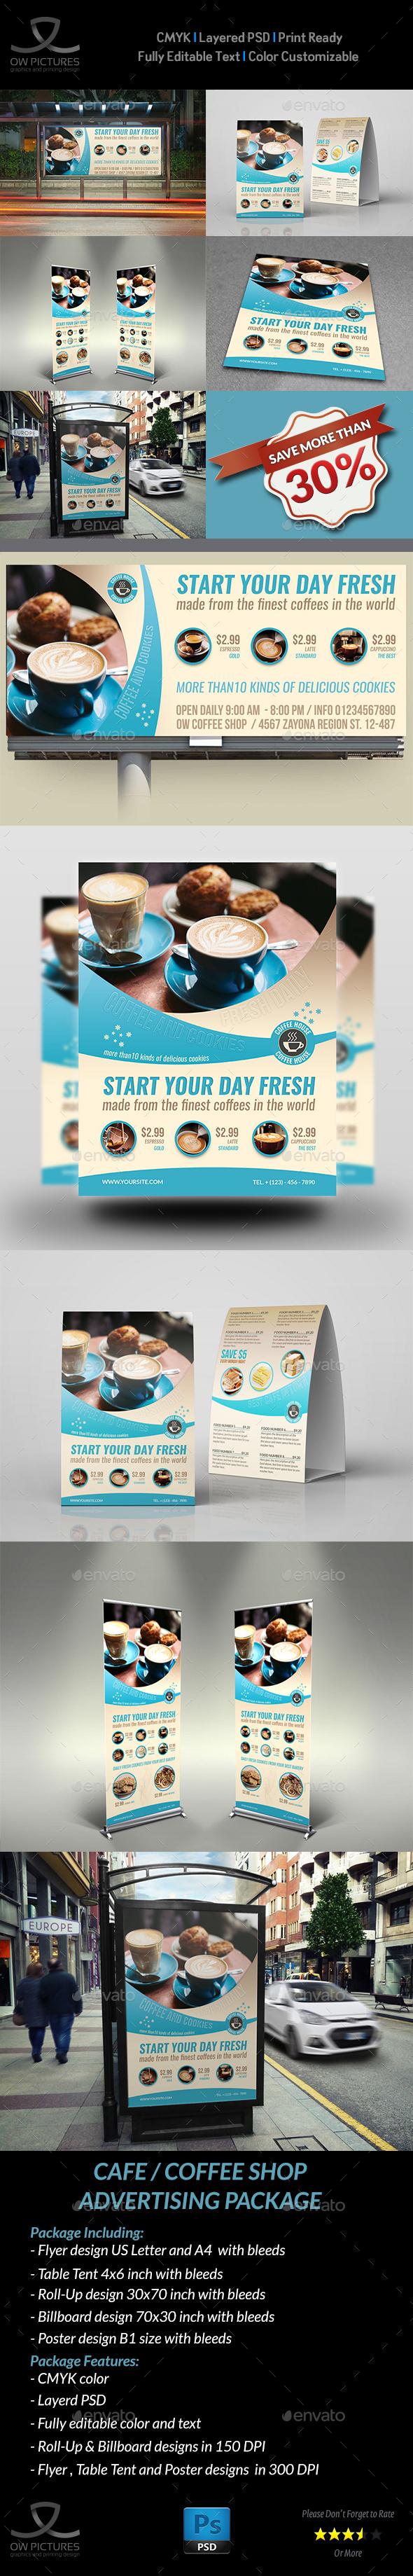 Cafe Advertising Bundle Vol.3 - Signage Print Templates